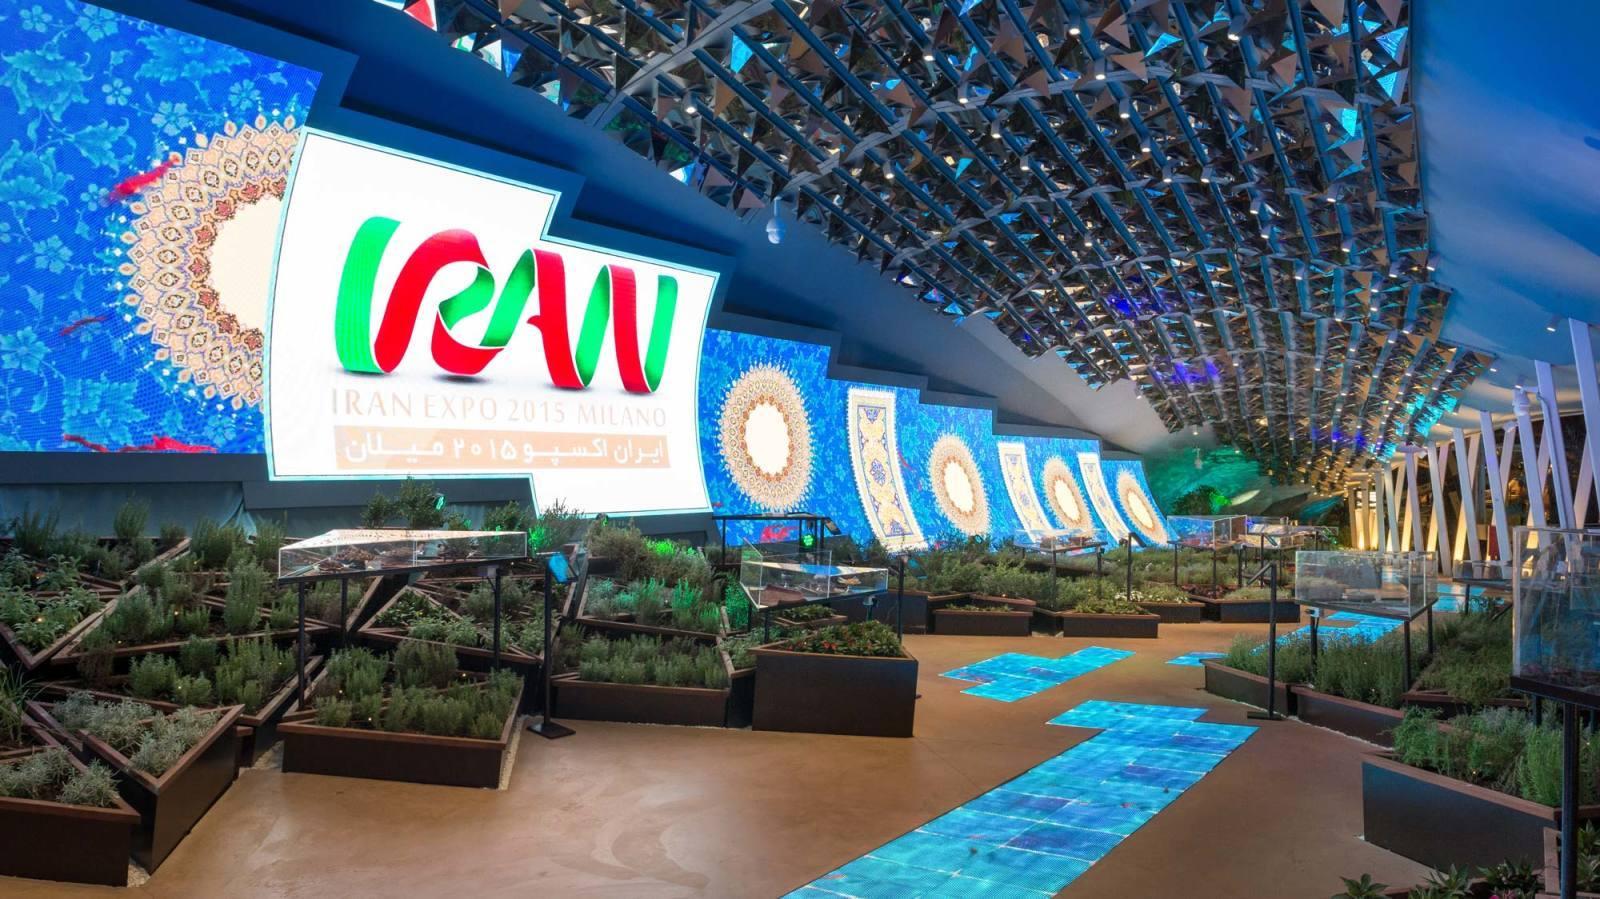 EXPO MILANO 2015 | IRAN PAVILION